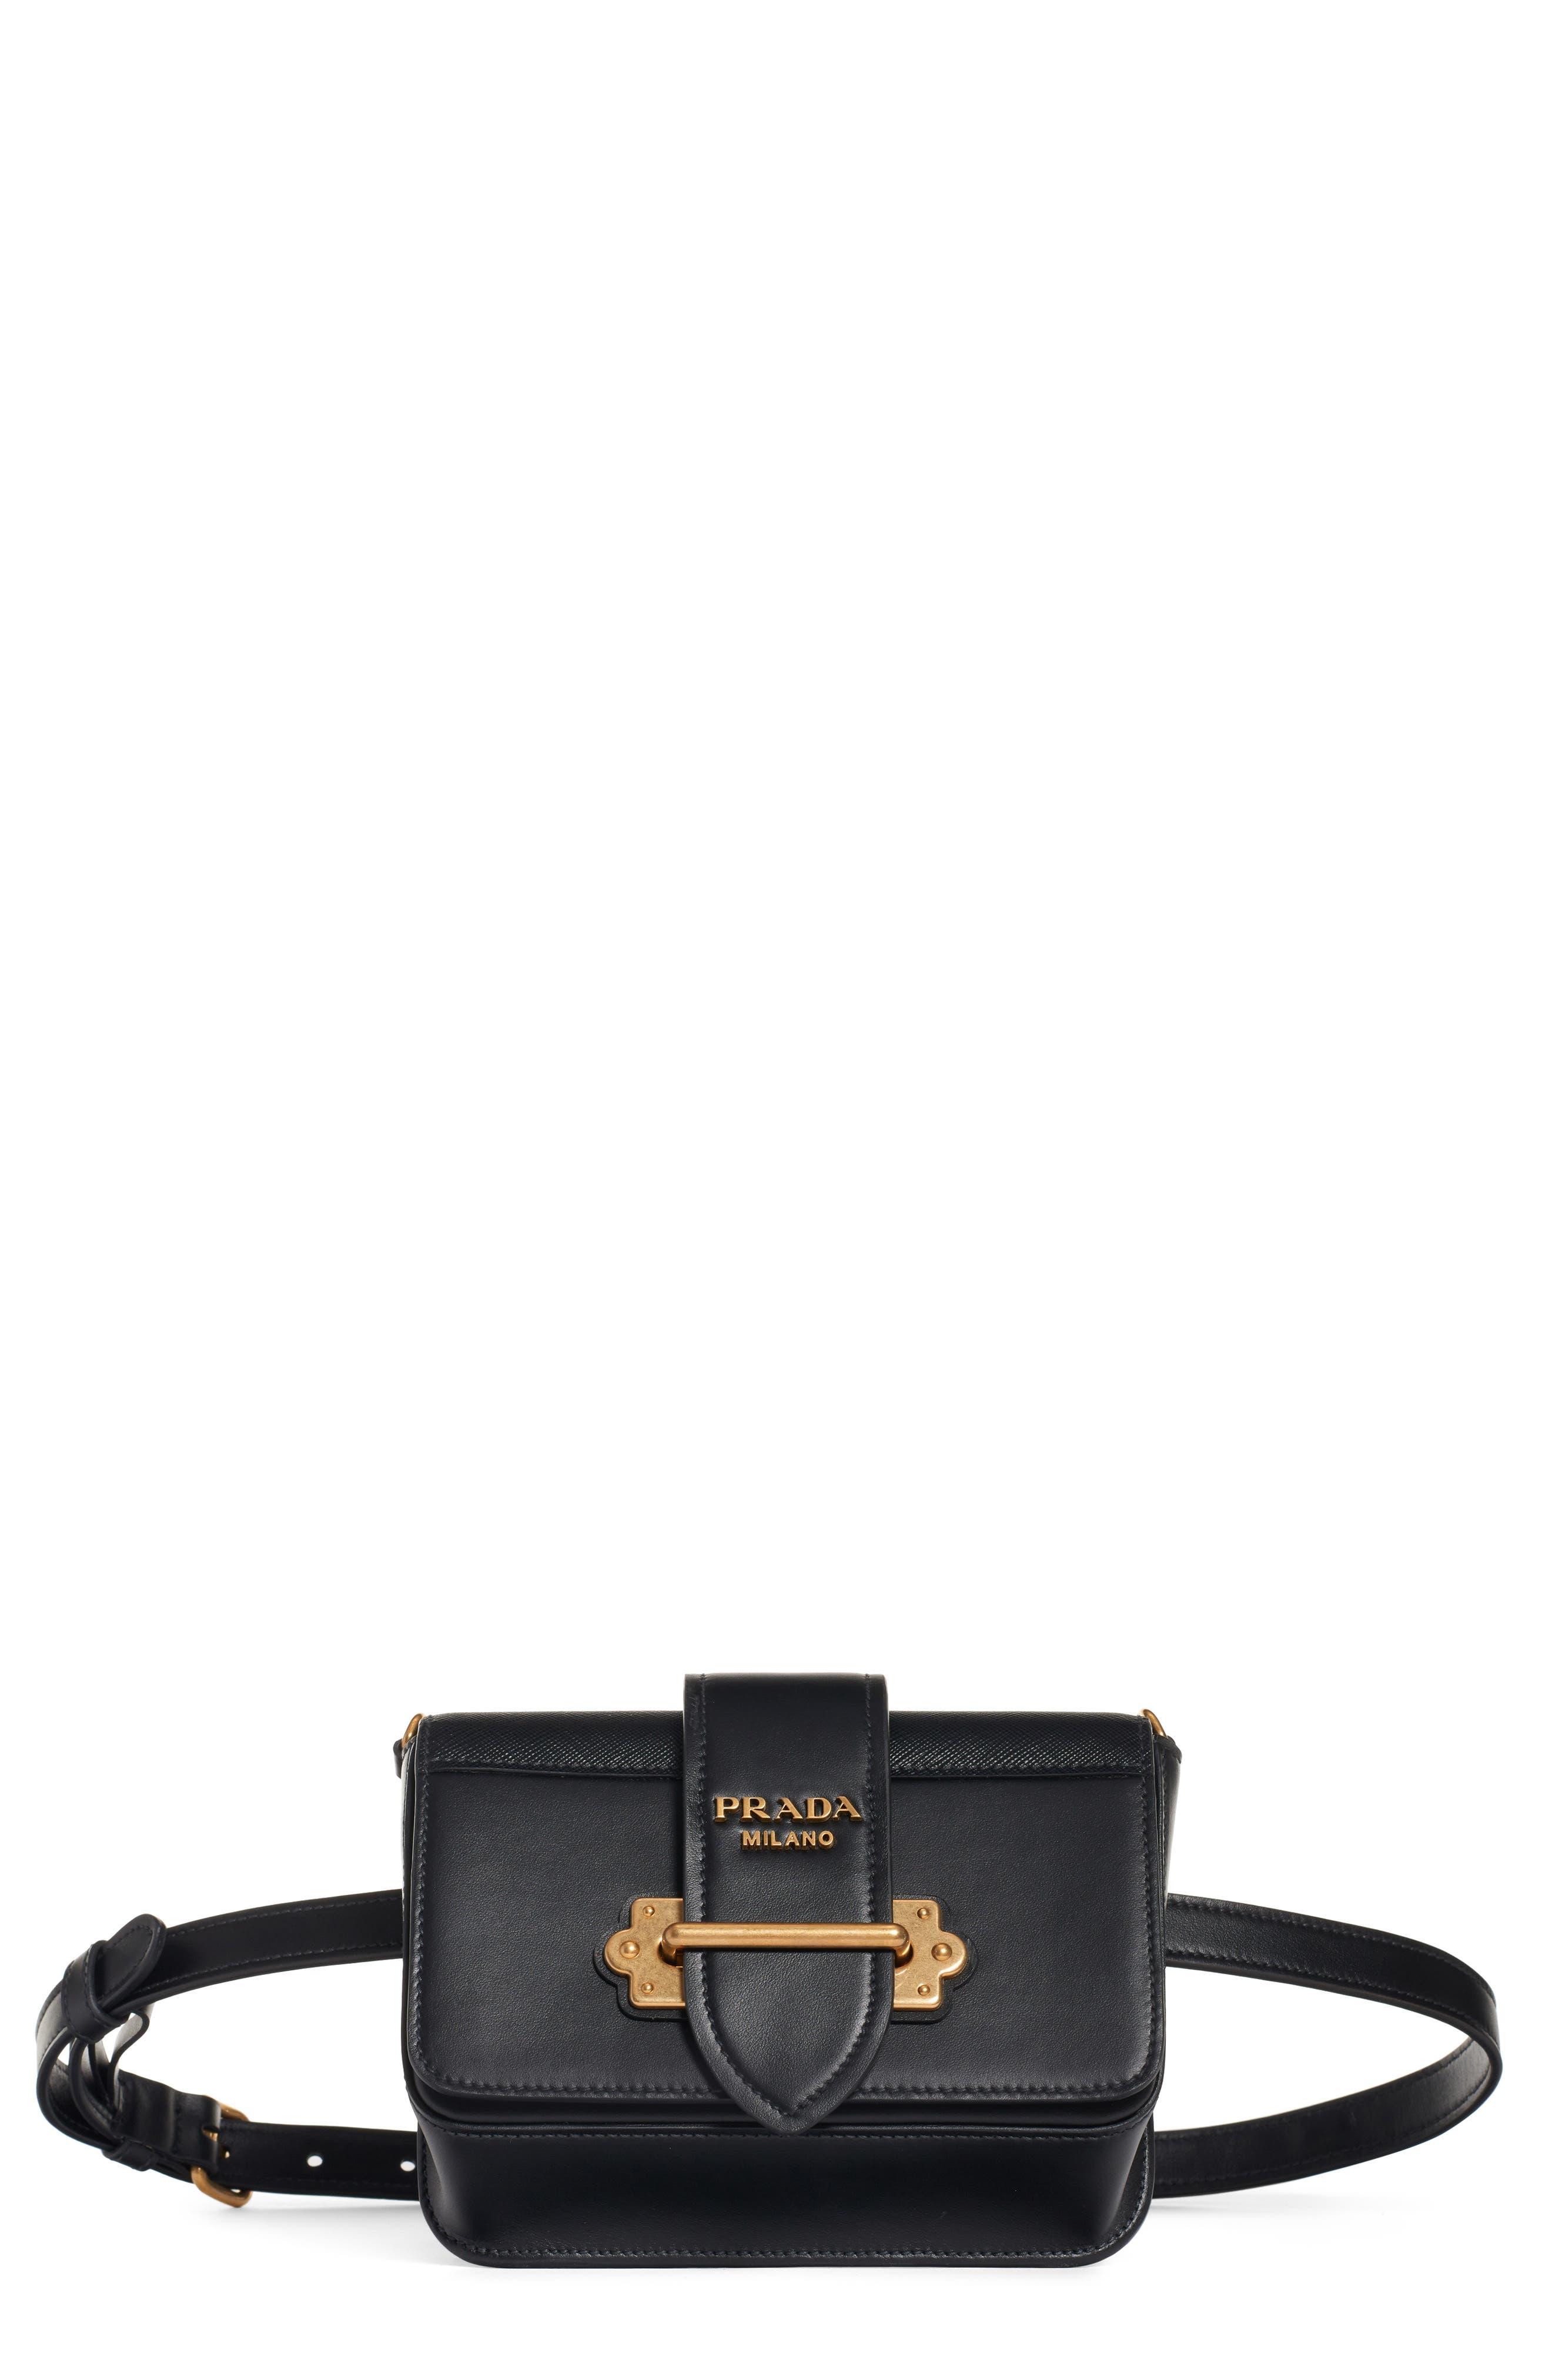 PRADA Cahier Leather Belt Bag, Main, color, 001